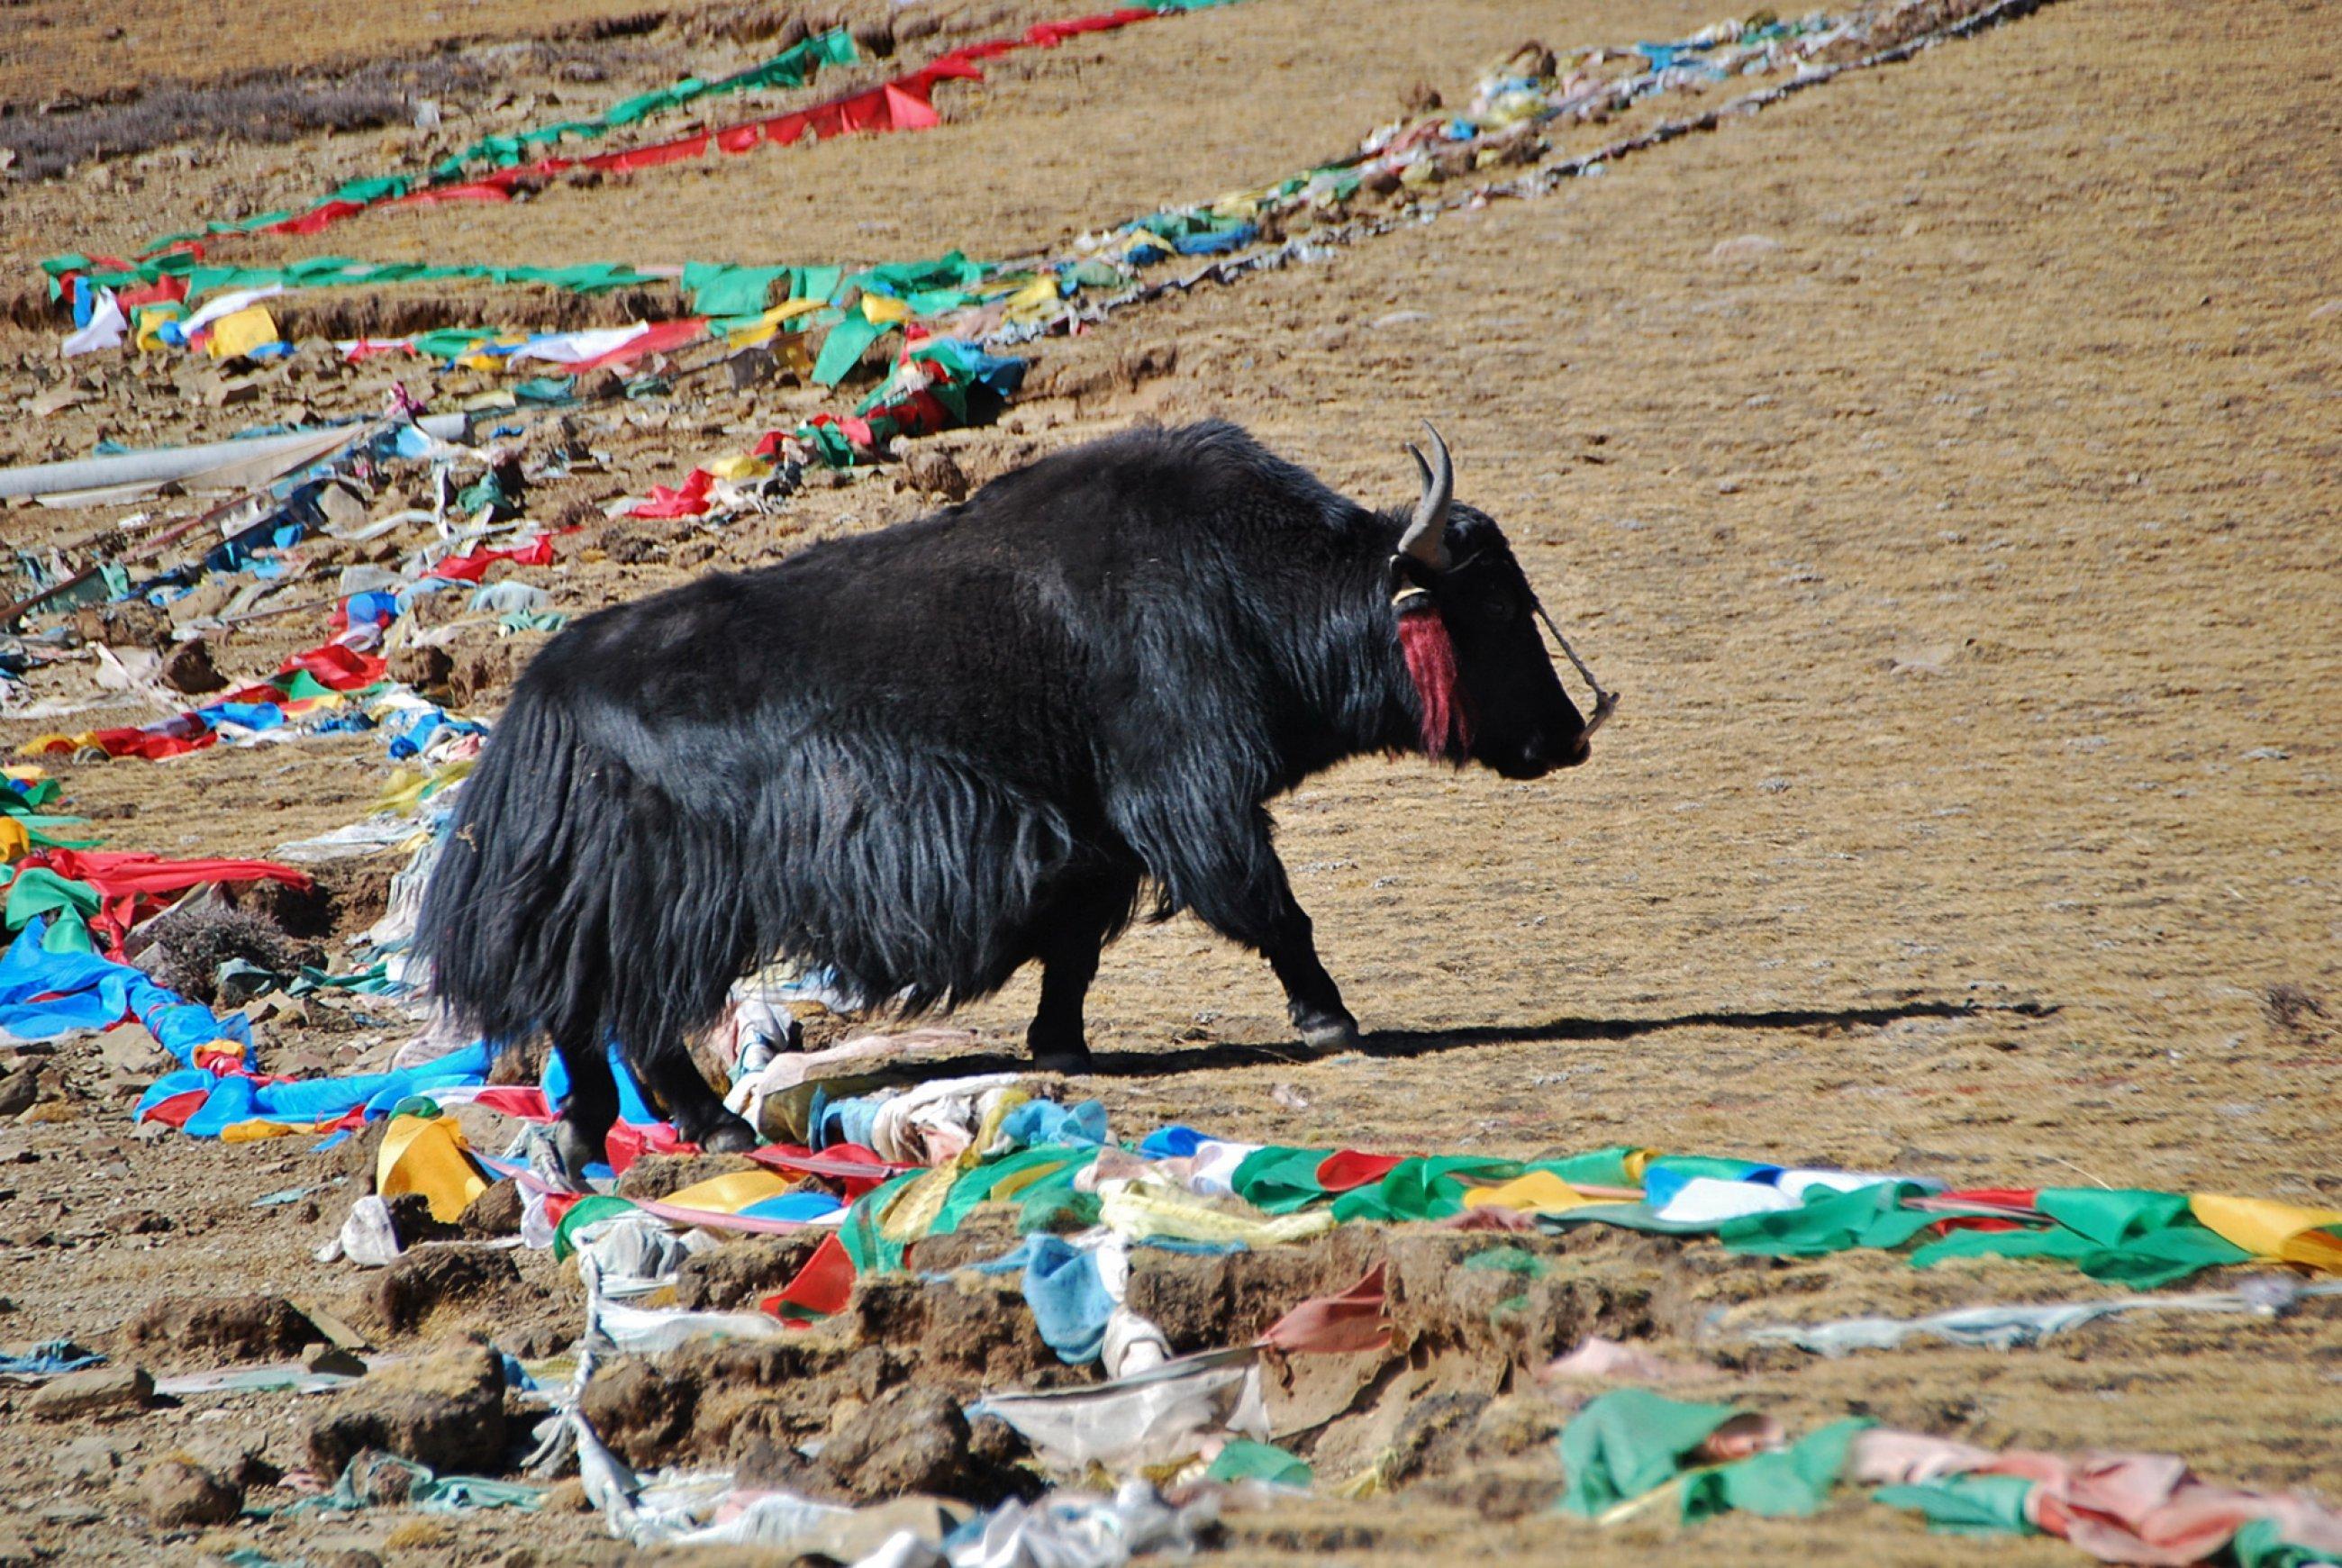 https://bubo.sk/uploads/galleries/16317/tibet-yamdrok-ctni-11-2014-mirka-sulka-218-.jpg